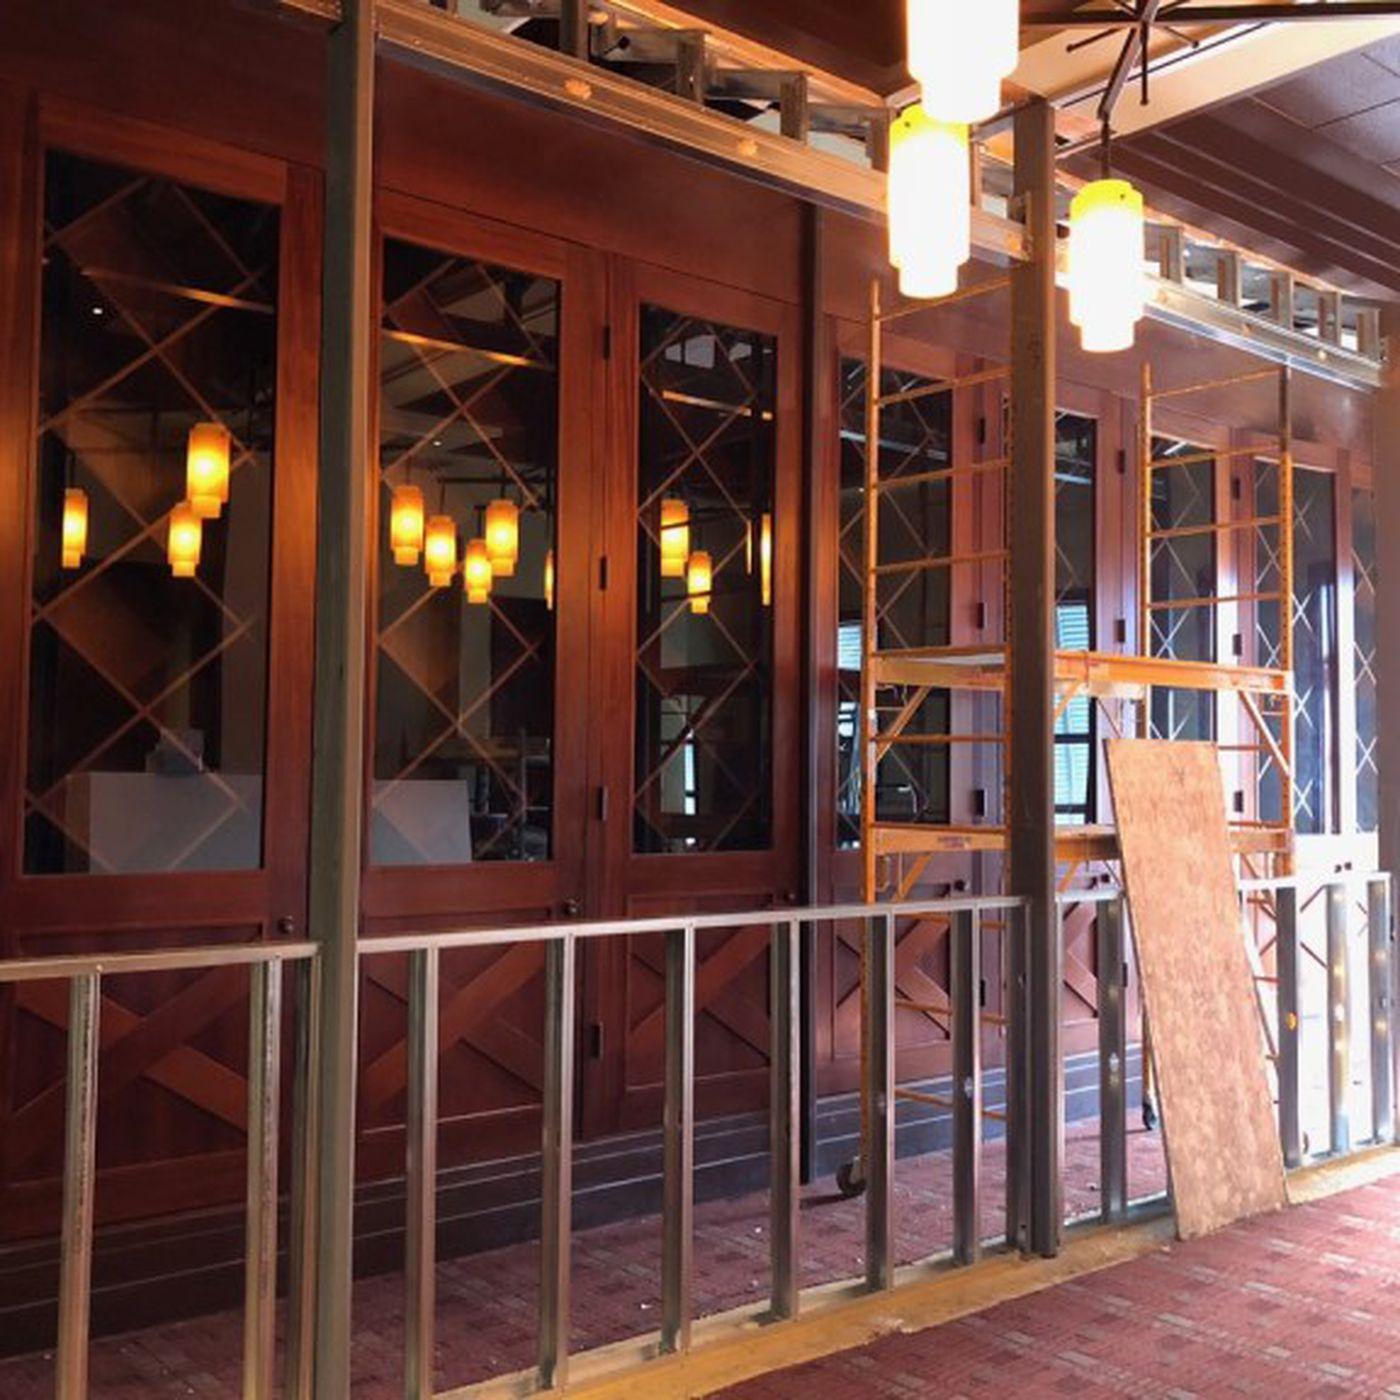 Lotus of Siam Is Building a Wine Room on Flamingo Eater Vegas